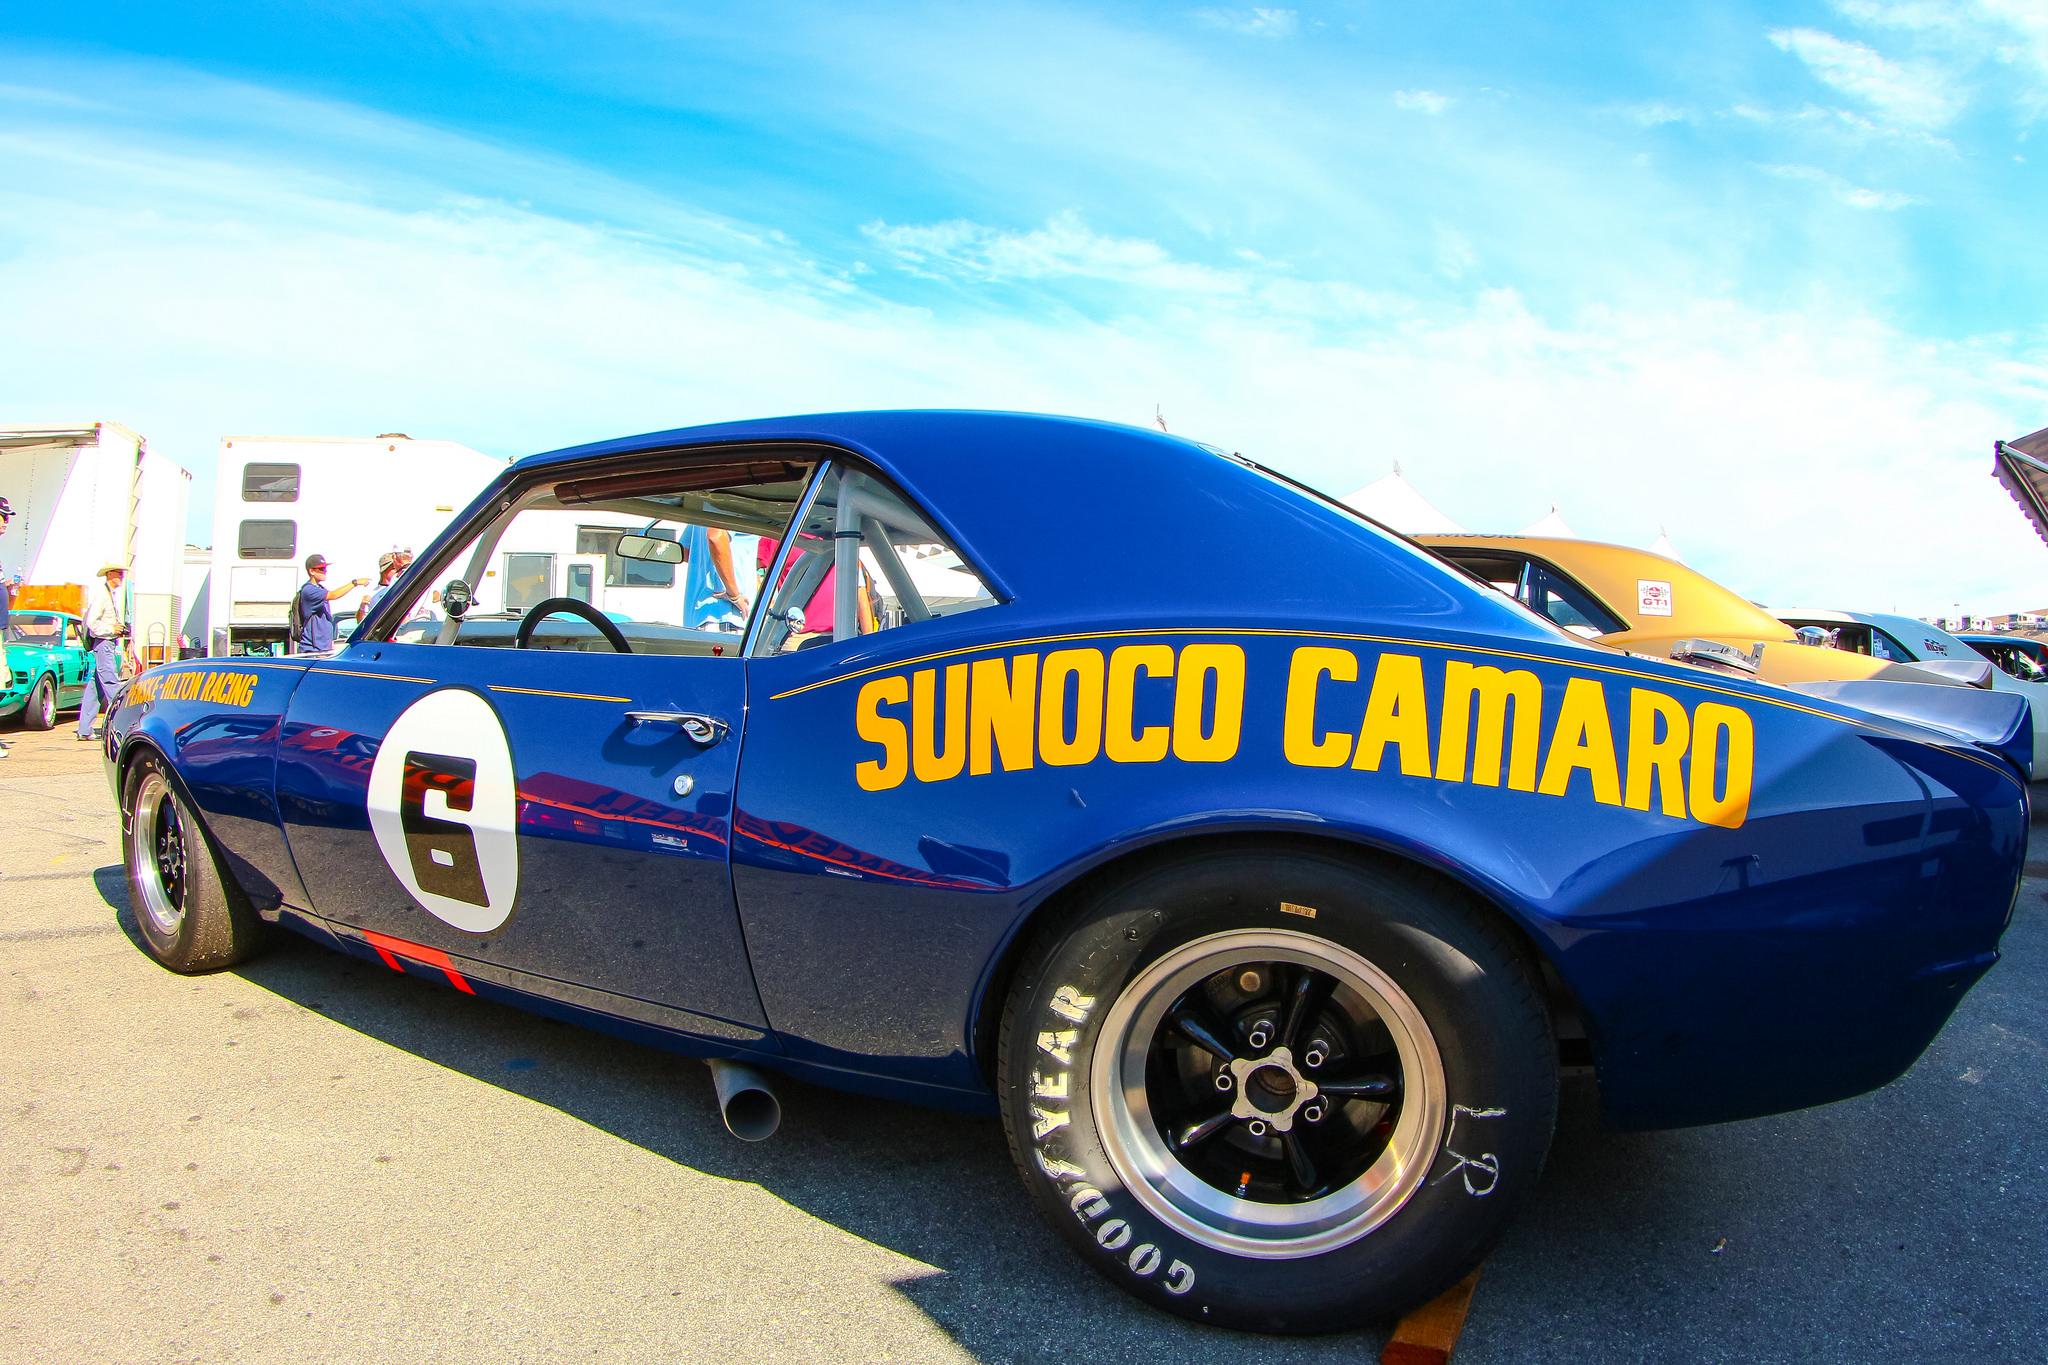 Penske Camero, Tran-Am Series. Shot from 2015 Monterey Motorsports Reunion.  ©Mark Farouk